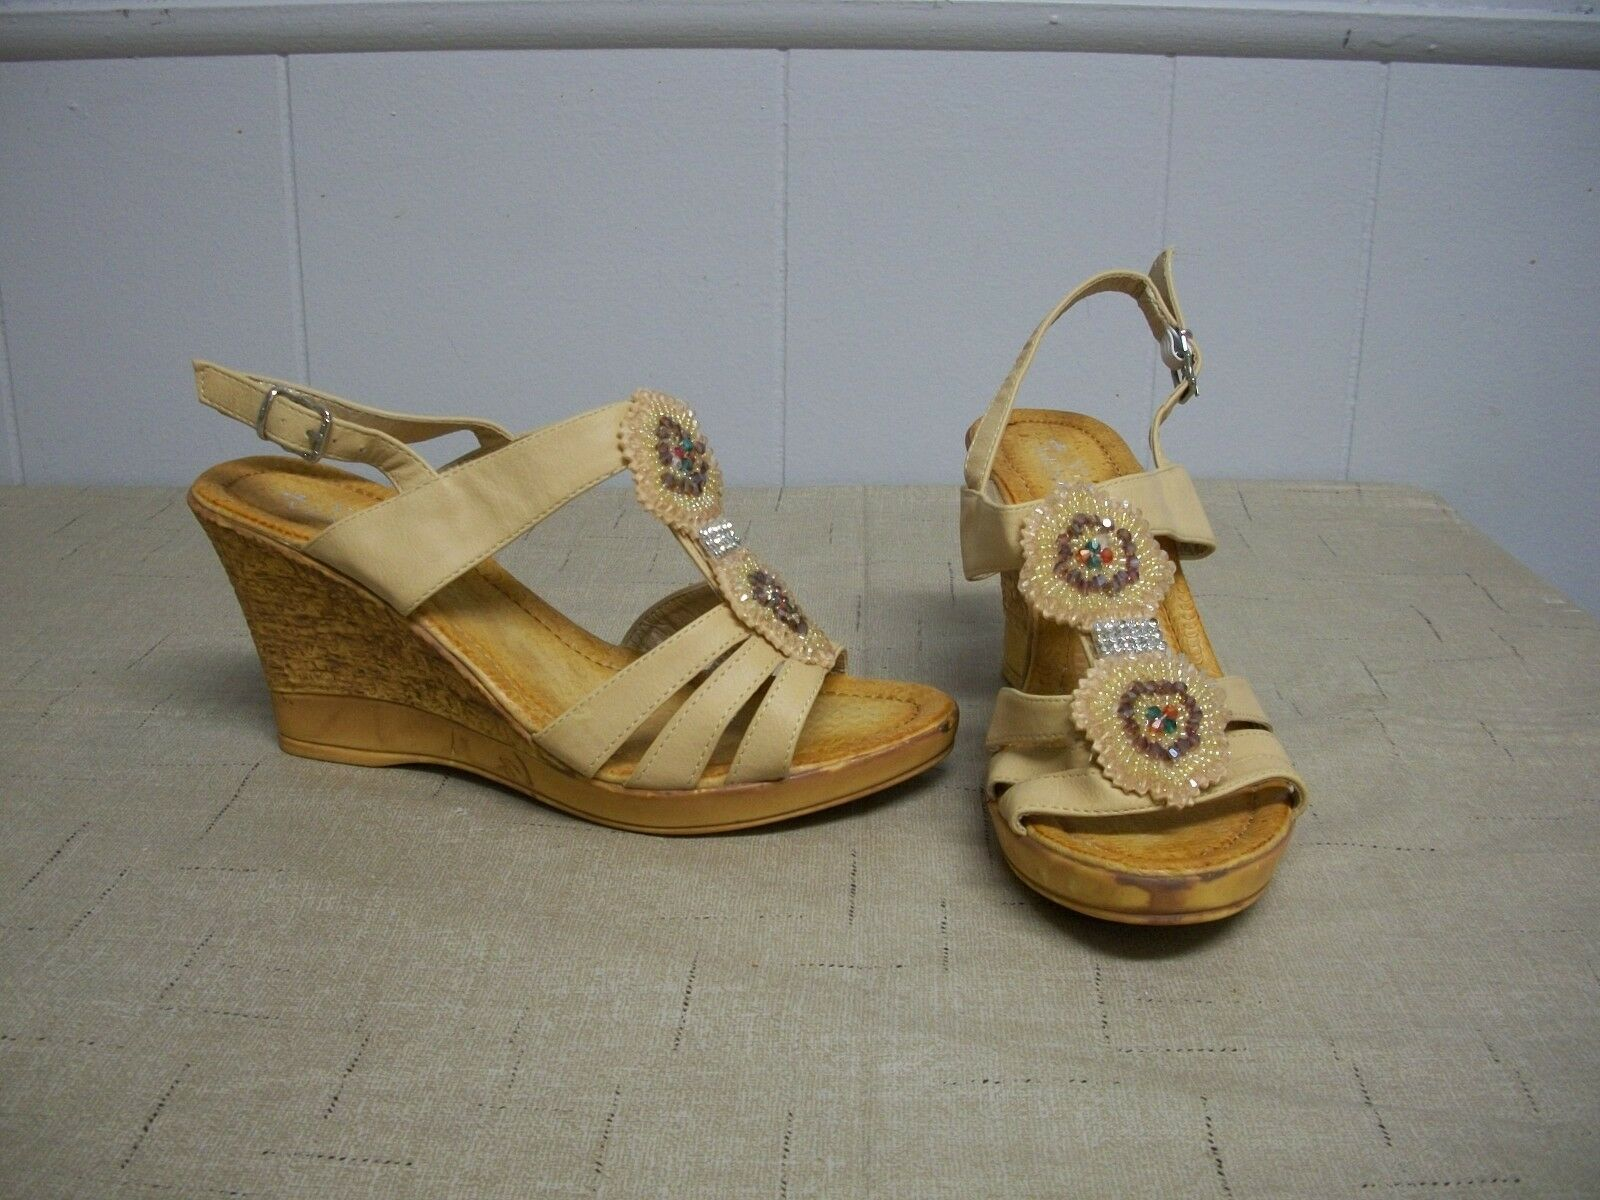 VIA VENETO Sofia Beige Beads Rhinestones Wedge Sz Heel Strap Sandals Shoes Sz Wedge 9 NIB 5e48ee